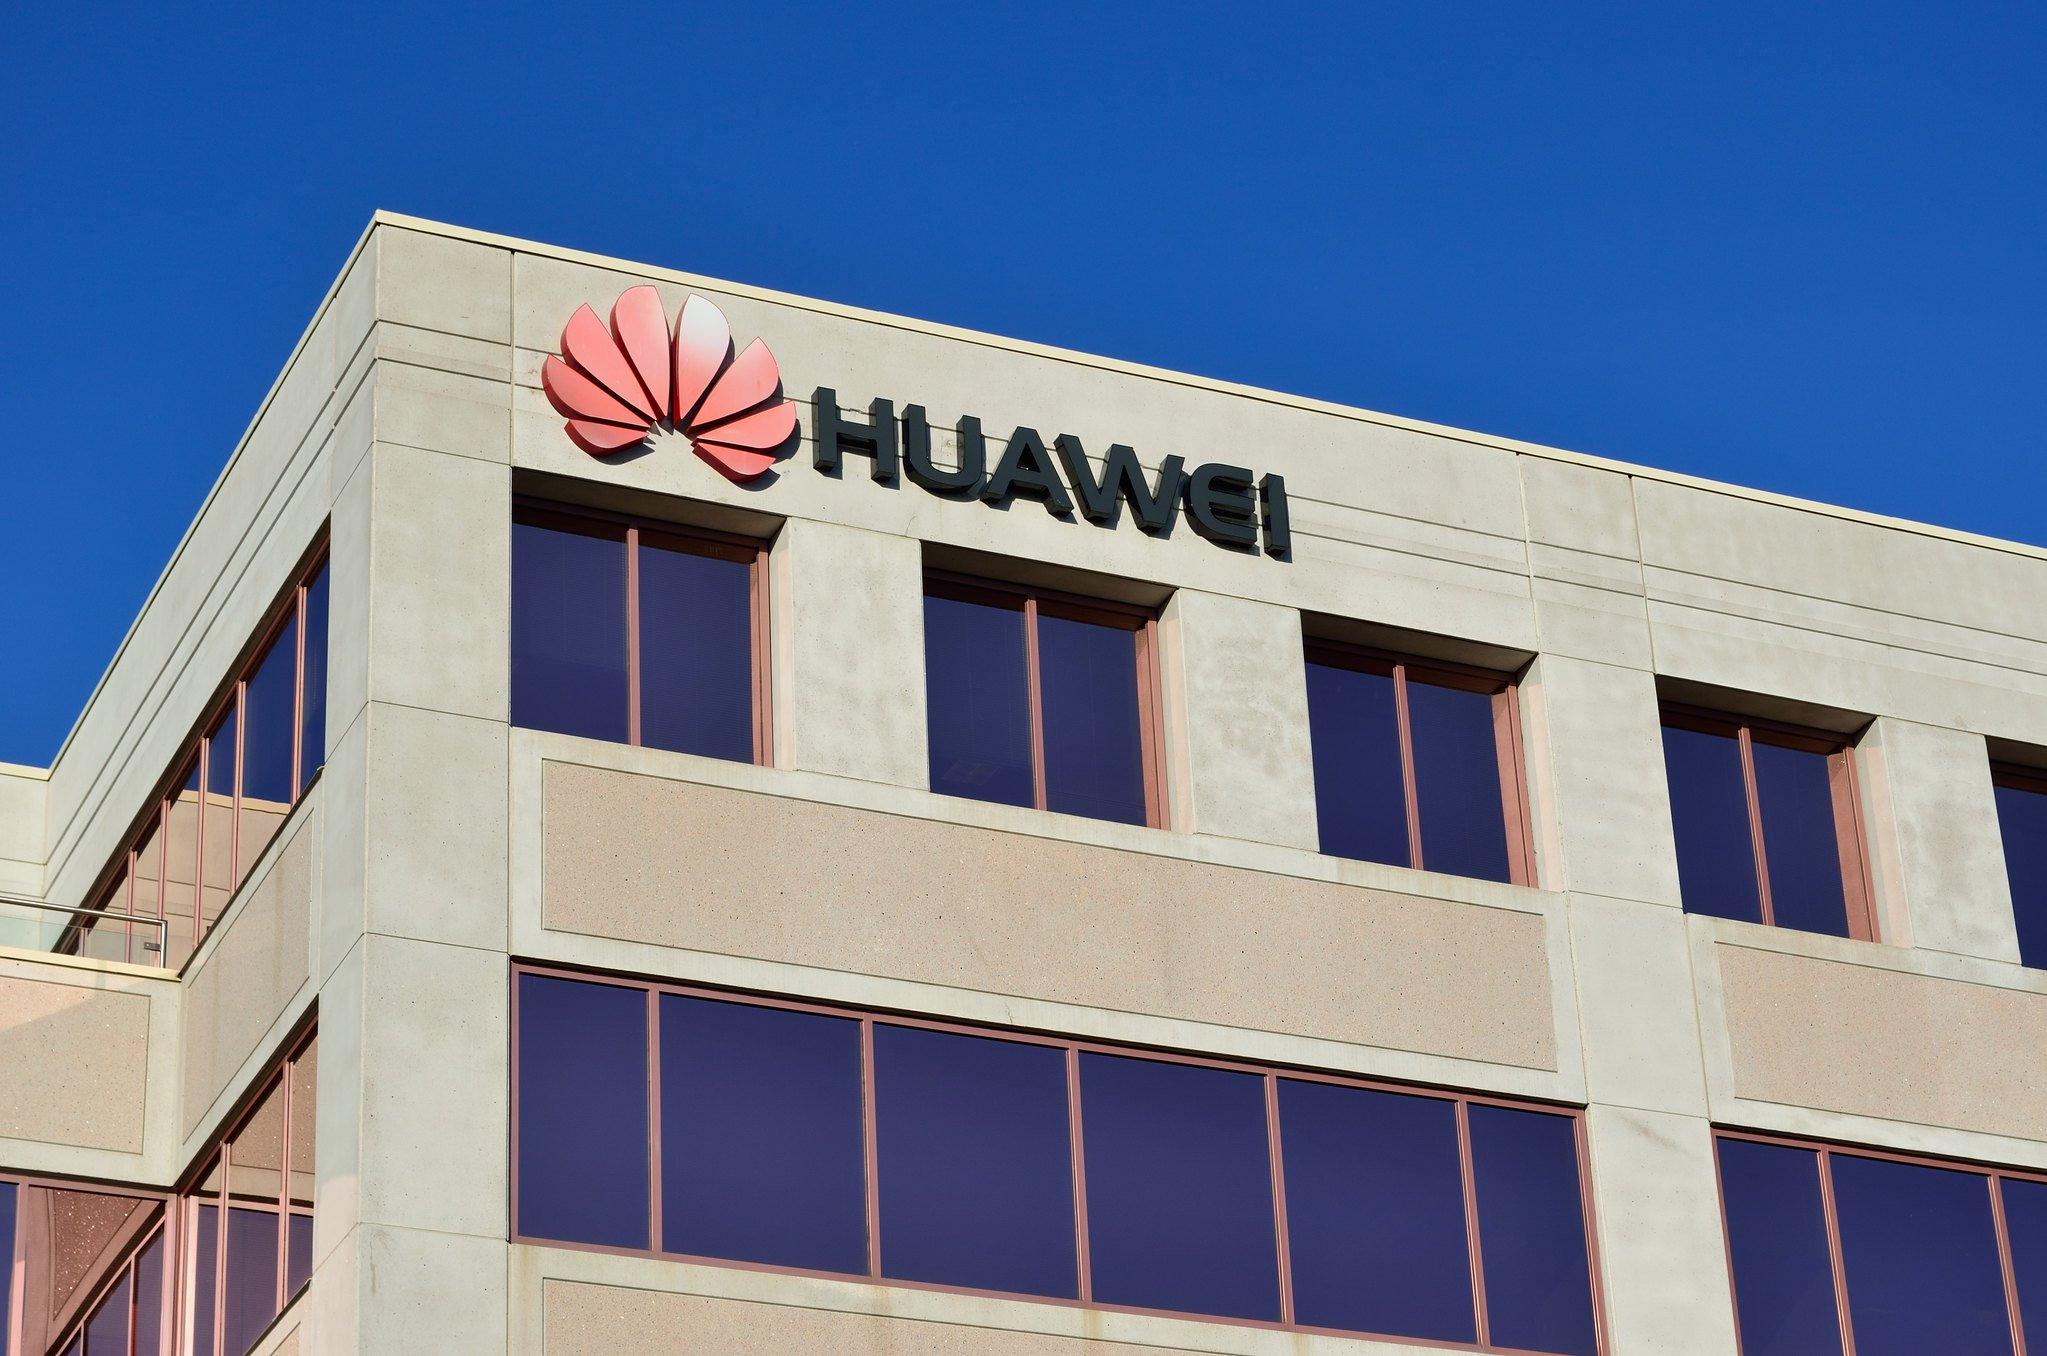 Huawei Gebäude mit Logo